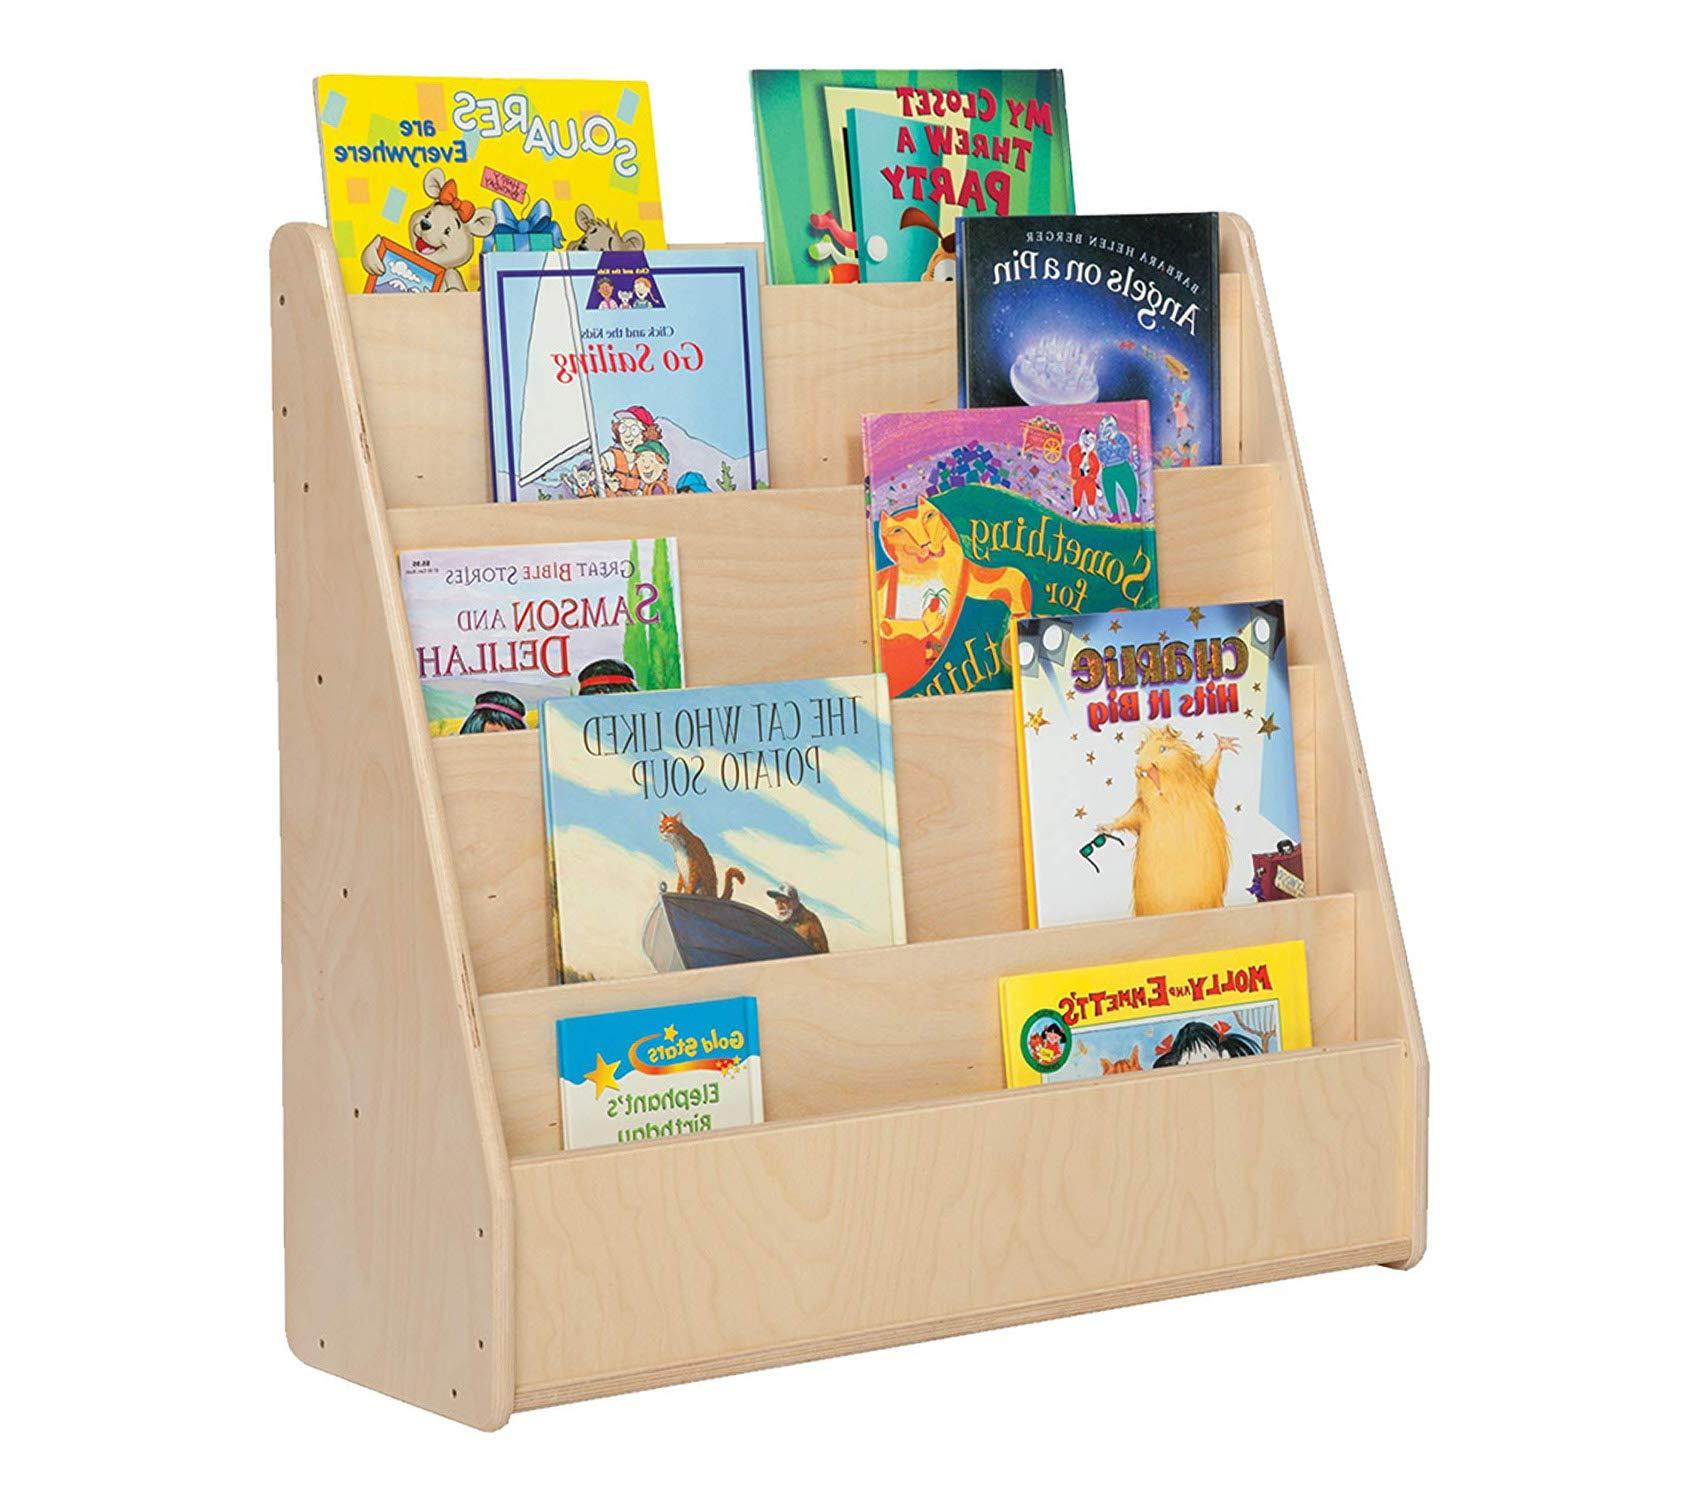 Sprоgs Wooden Book Shelf/Display, 29 Height, 10 1/2 Wide, 30 Length, Natural